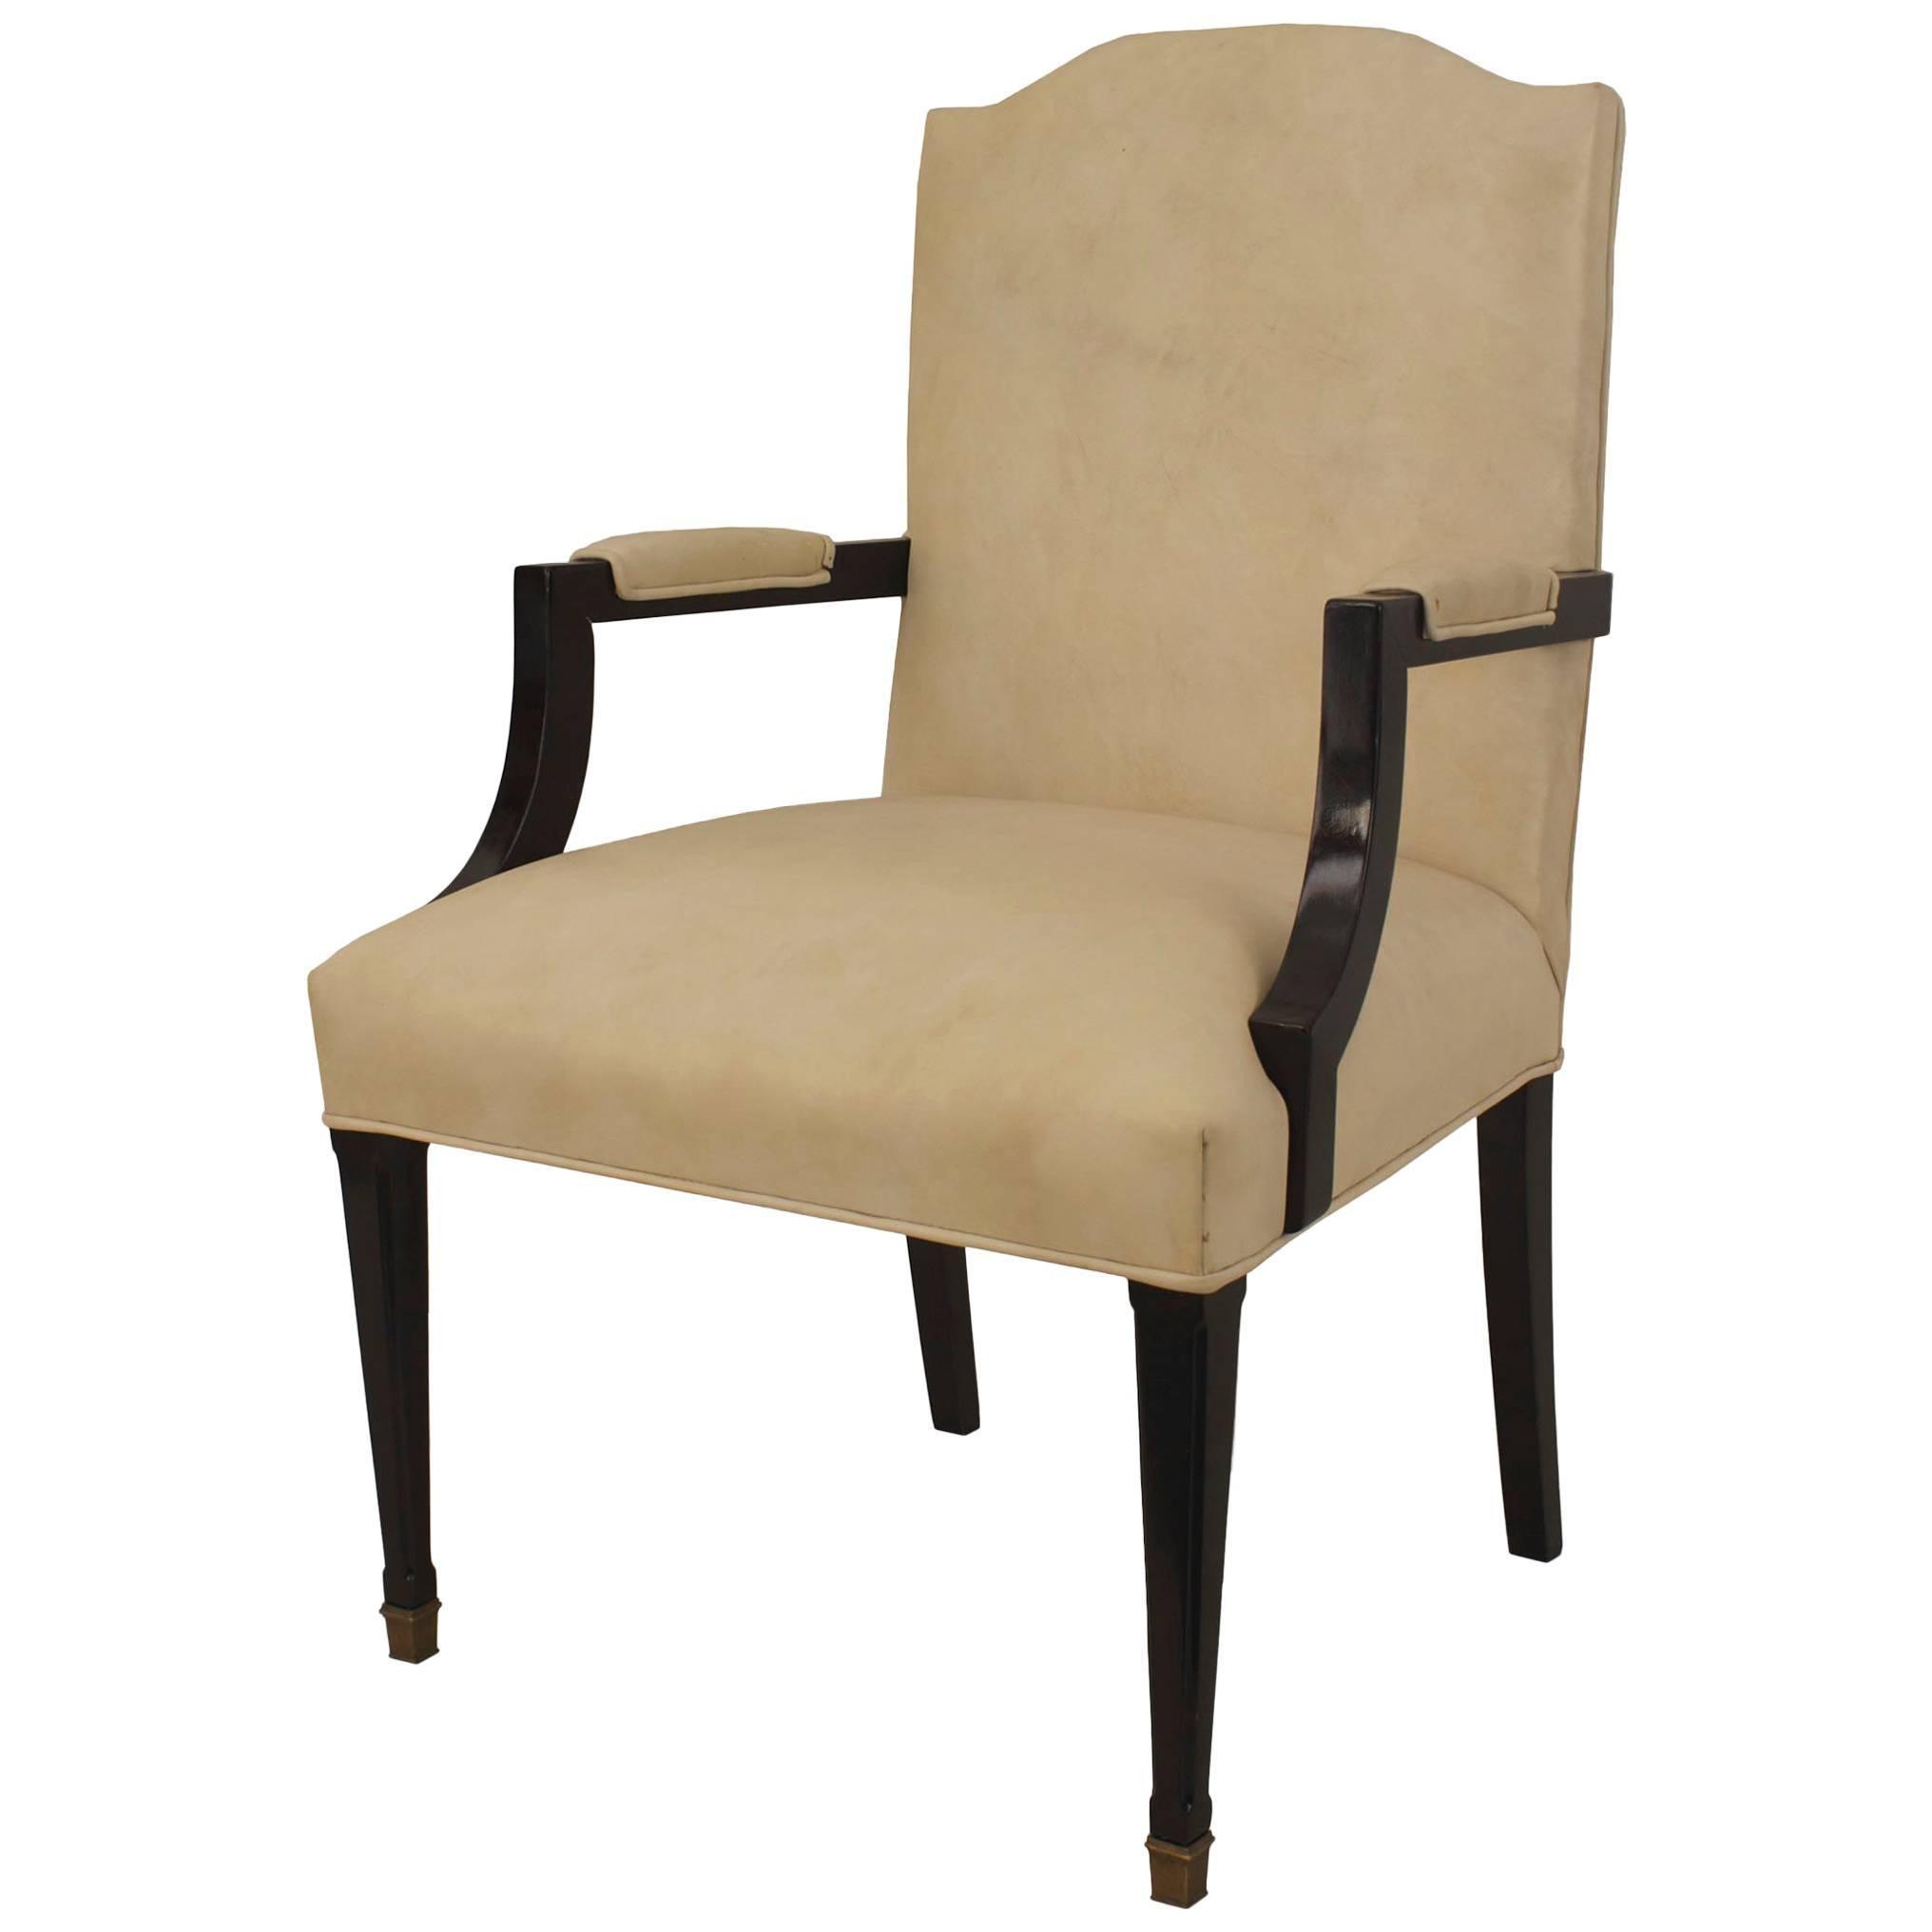 French 1940s 'Louis XVI Style' Ebonized Armchair